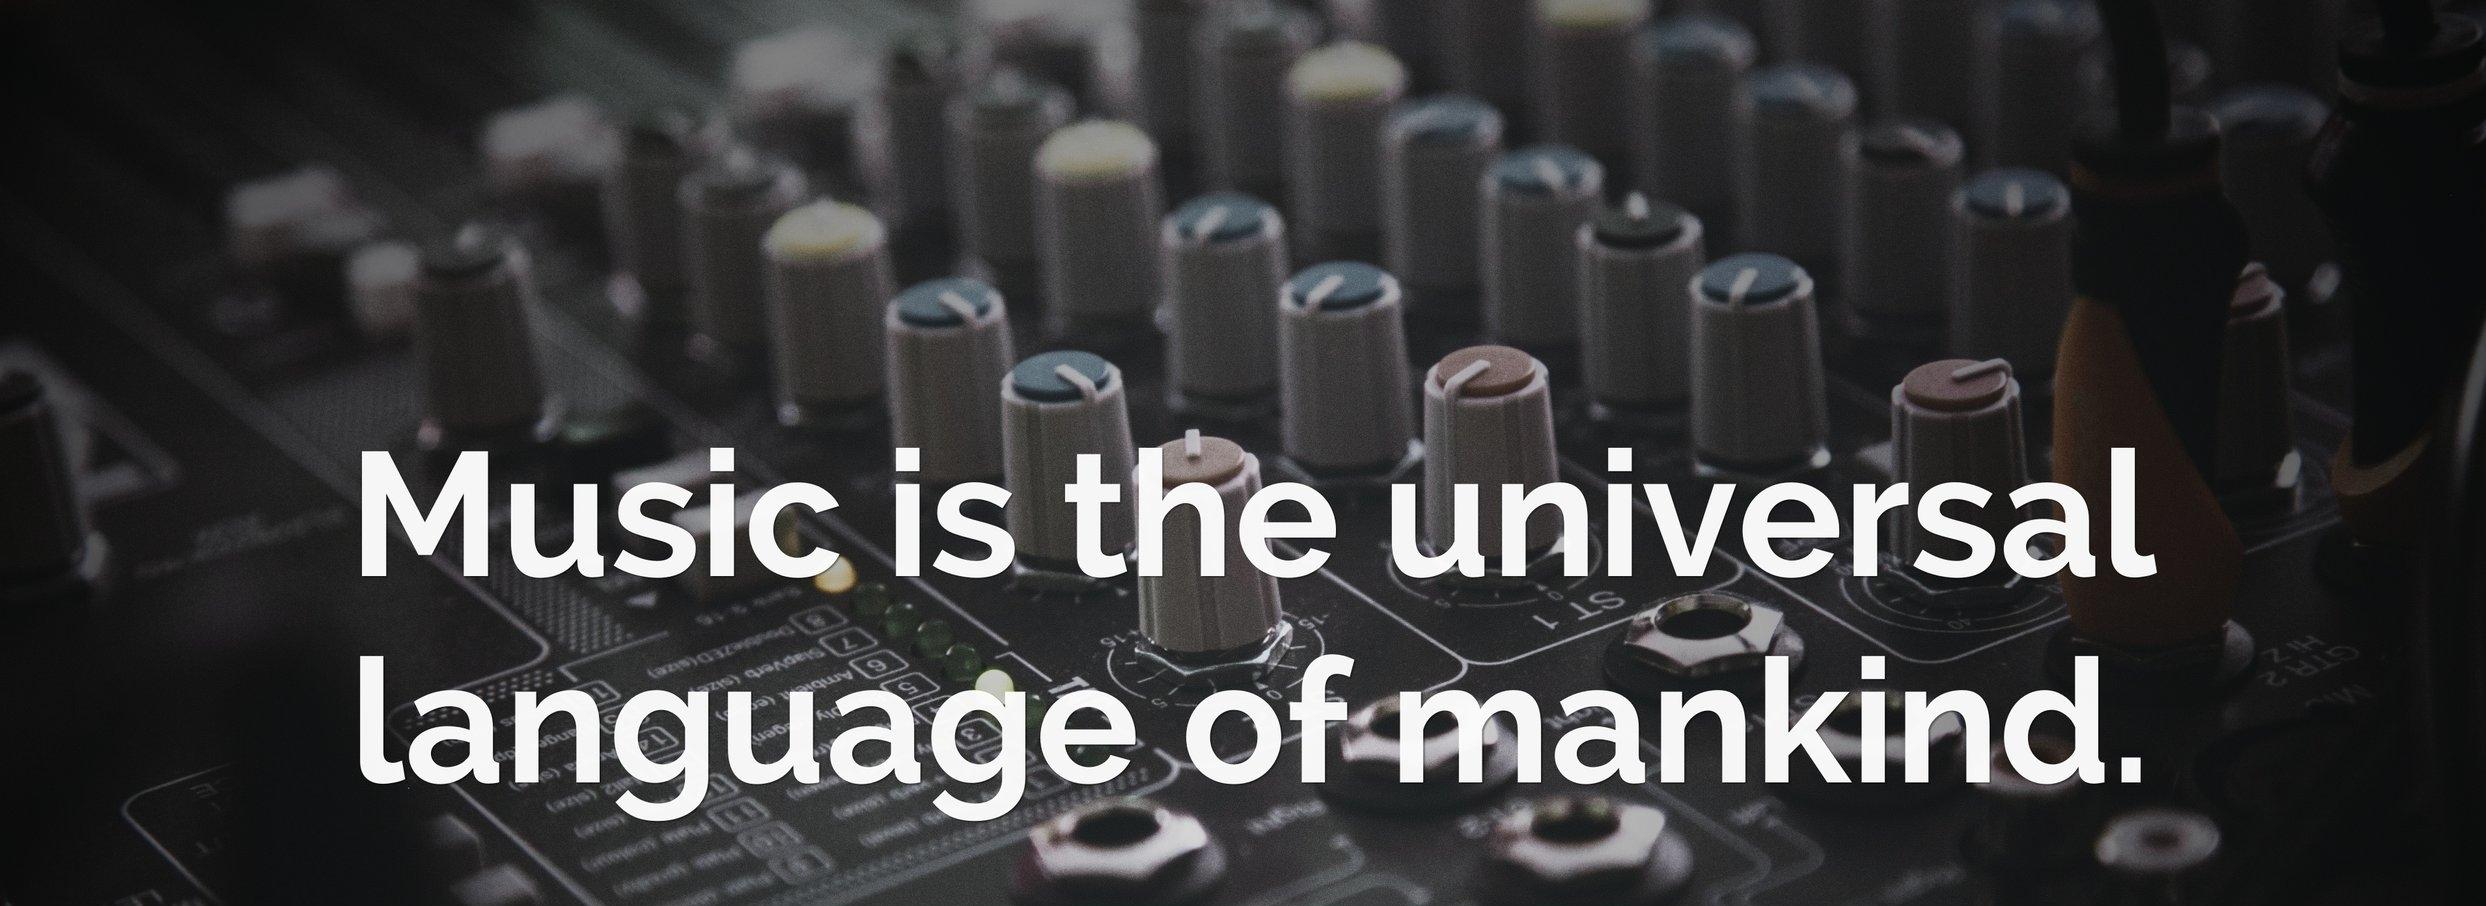 28146-Henry-Wadsworth-Longfellow-Quote-Music-is-the-universal-language-1.jpg